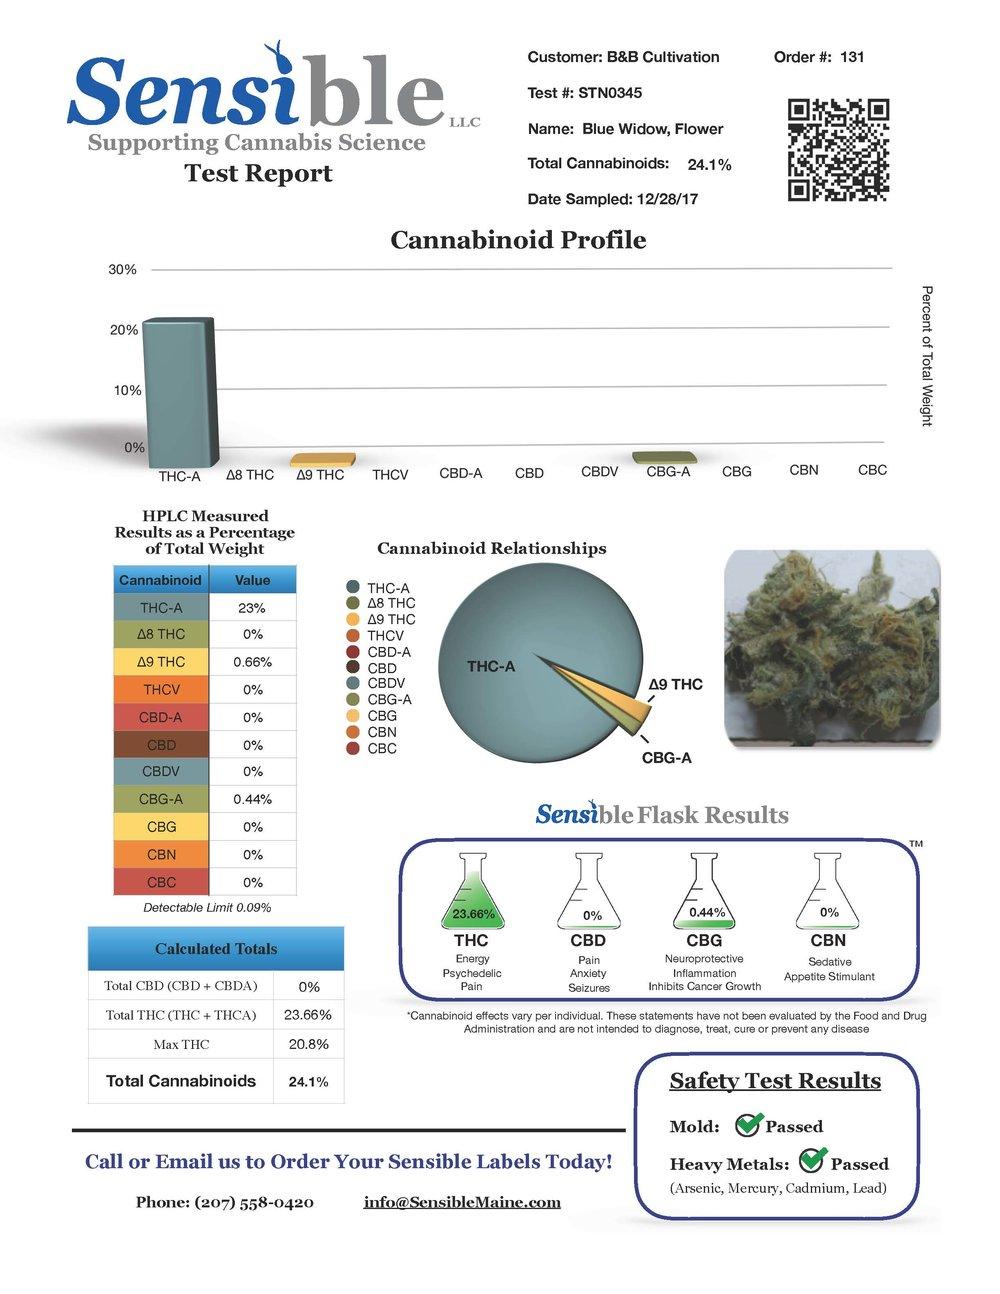 Test Report stn0345.jpg